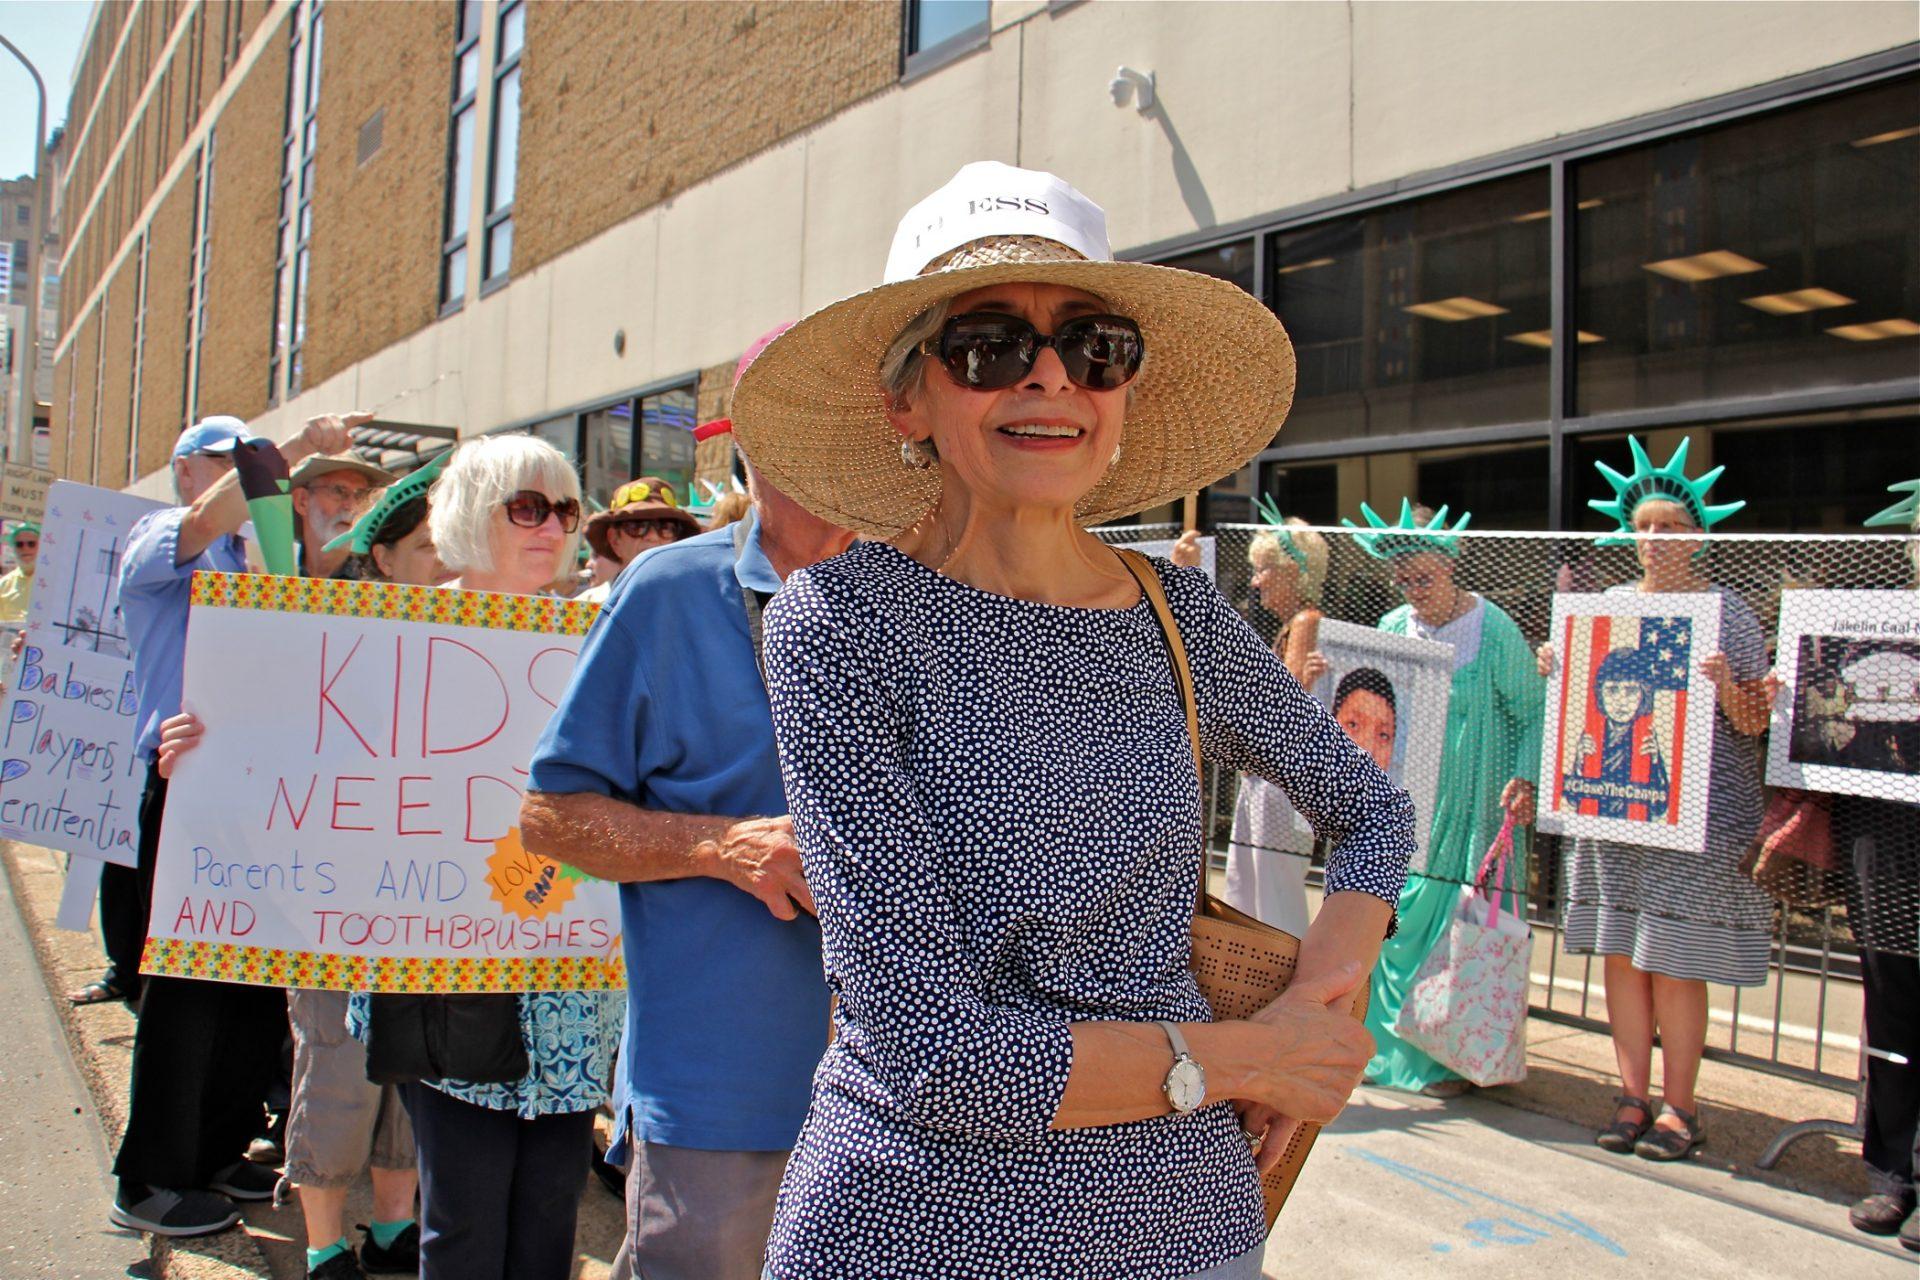 Aurora Camacho De Schmidt of ElderWitness participates in a protest outside Philadelphia's ICE field office.